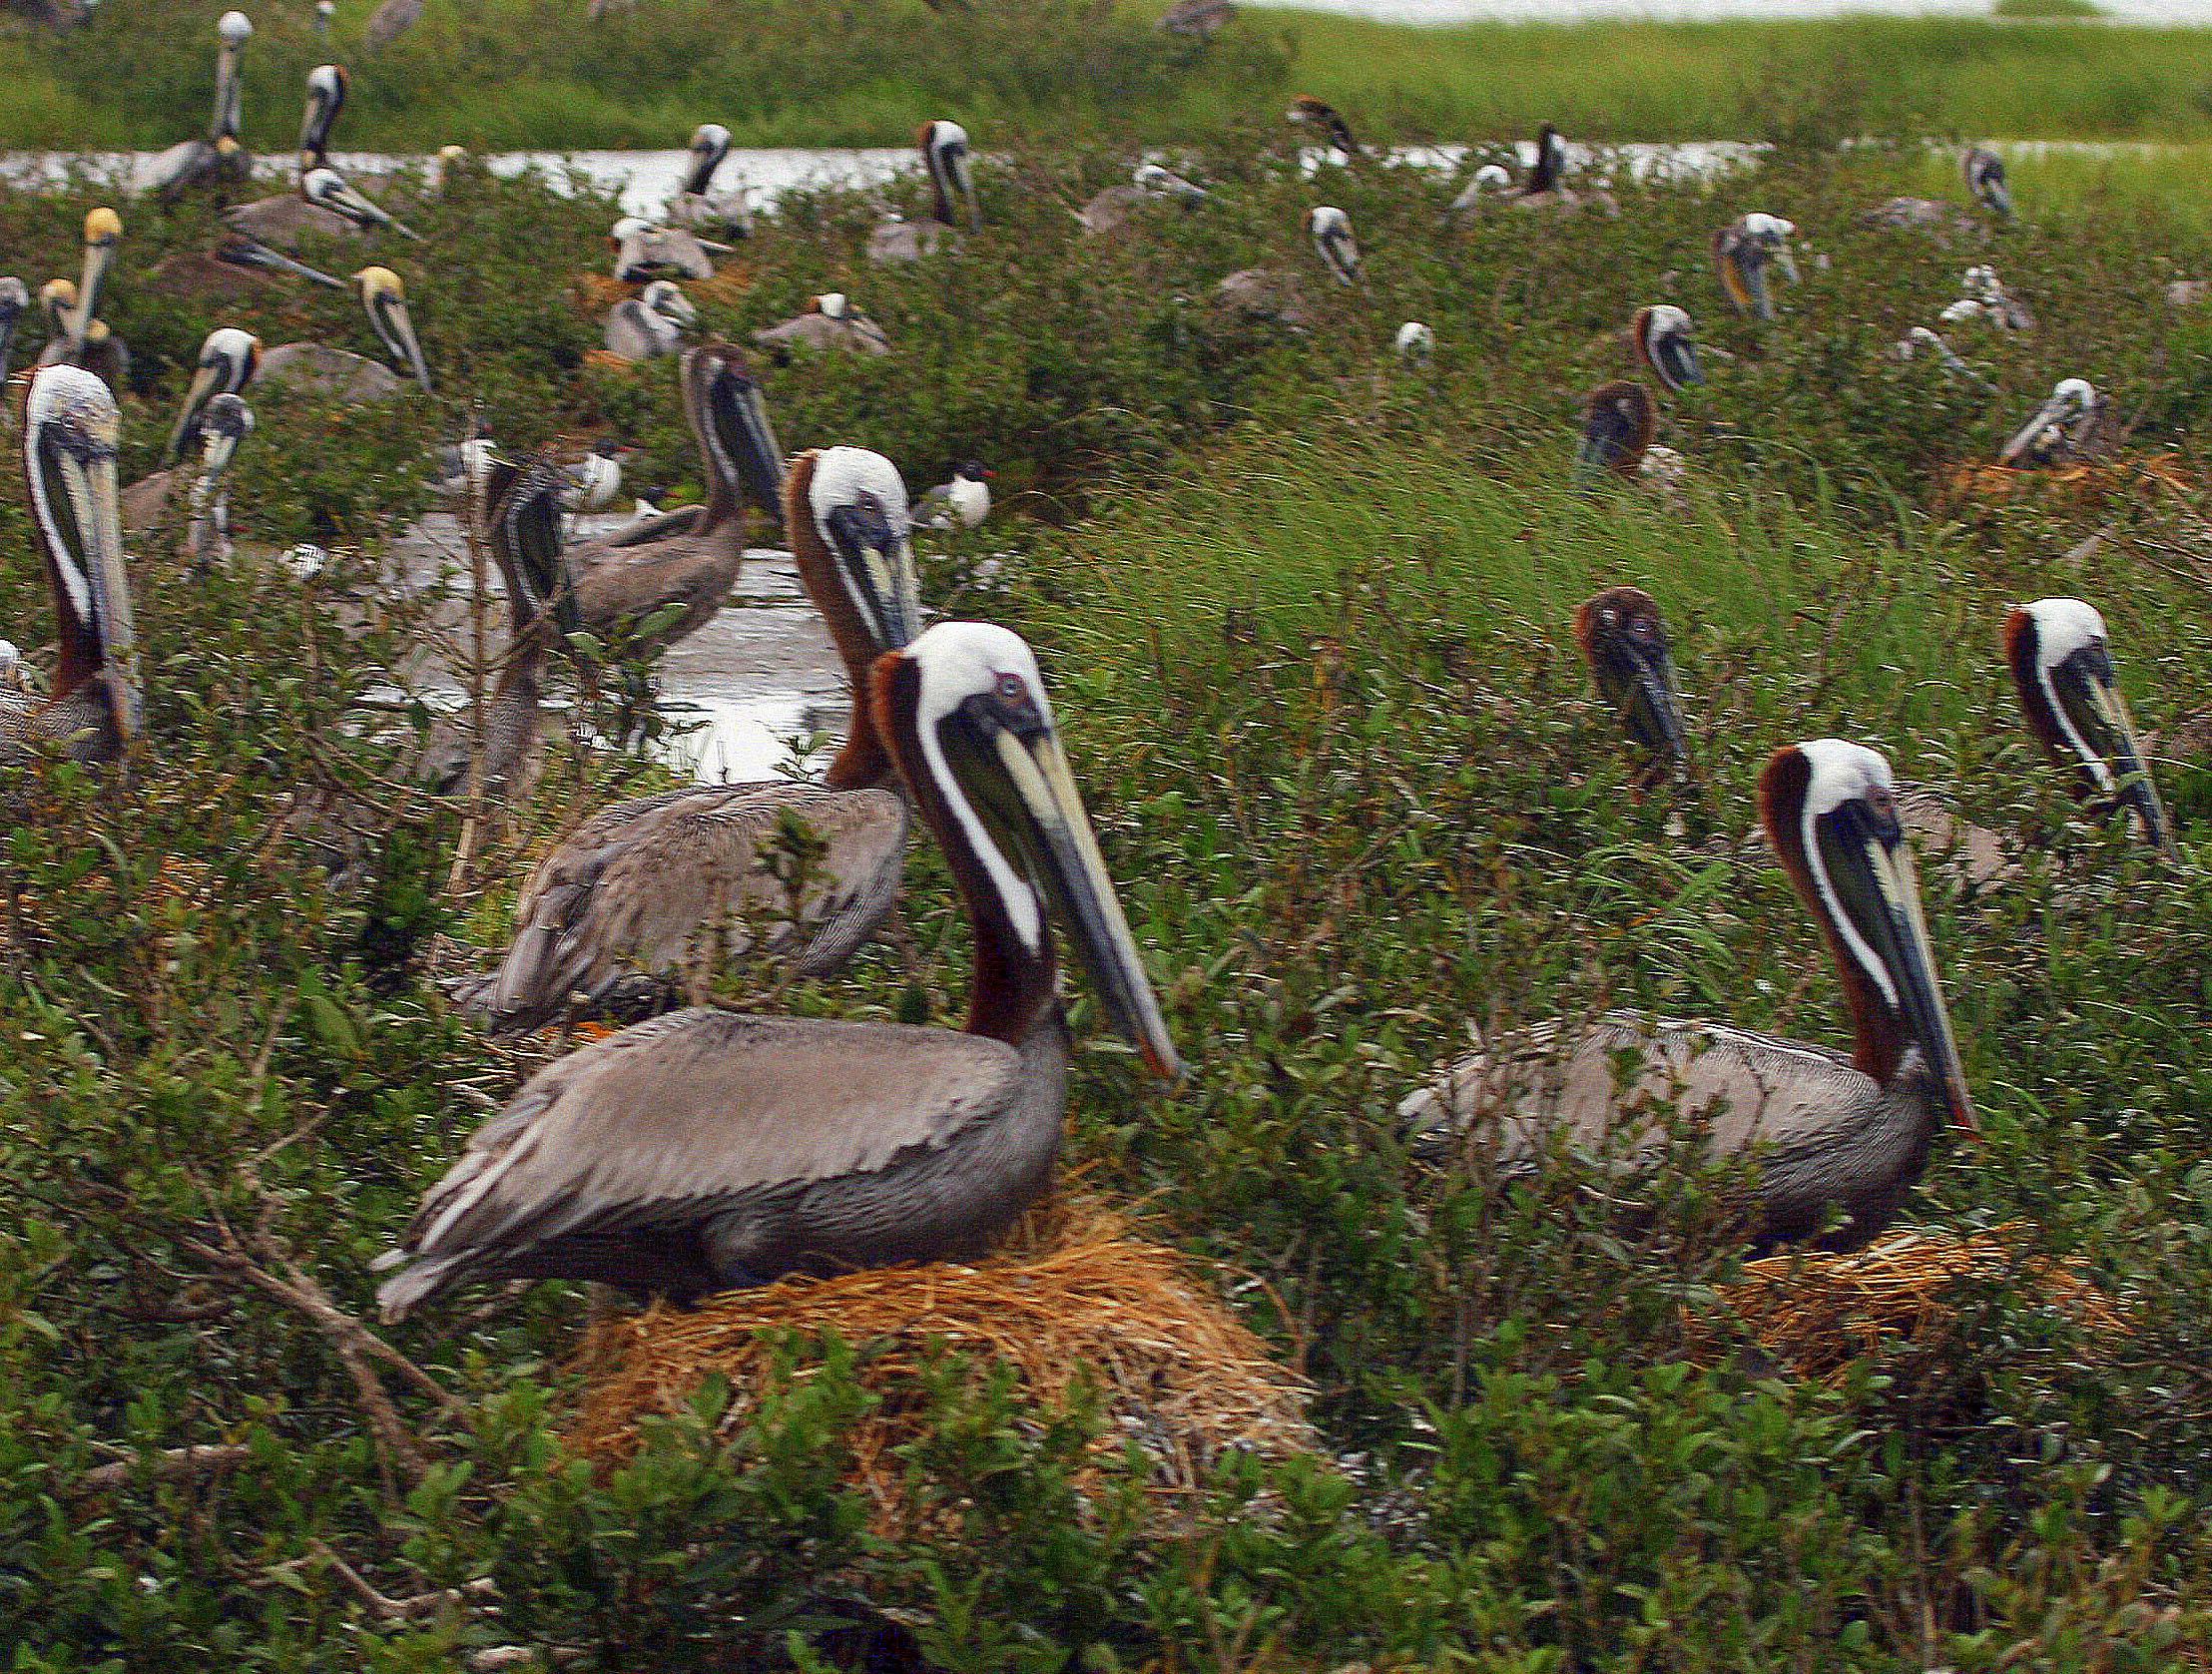 Nesting brown pelicans